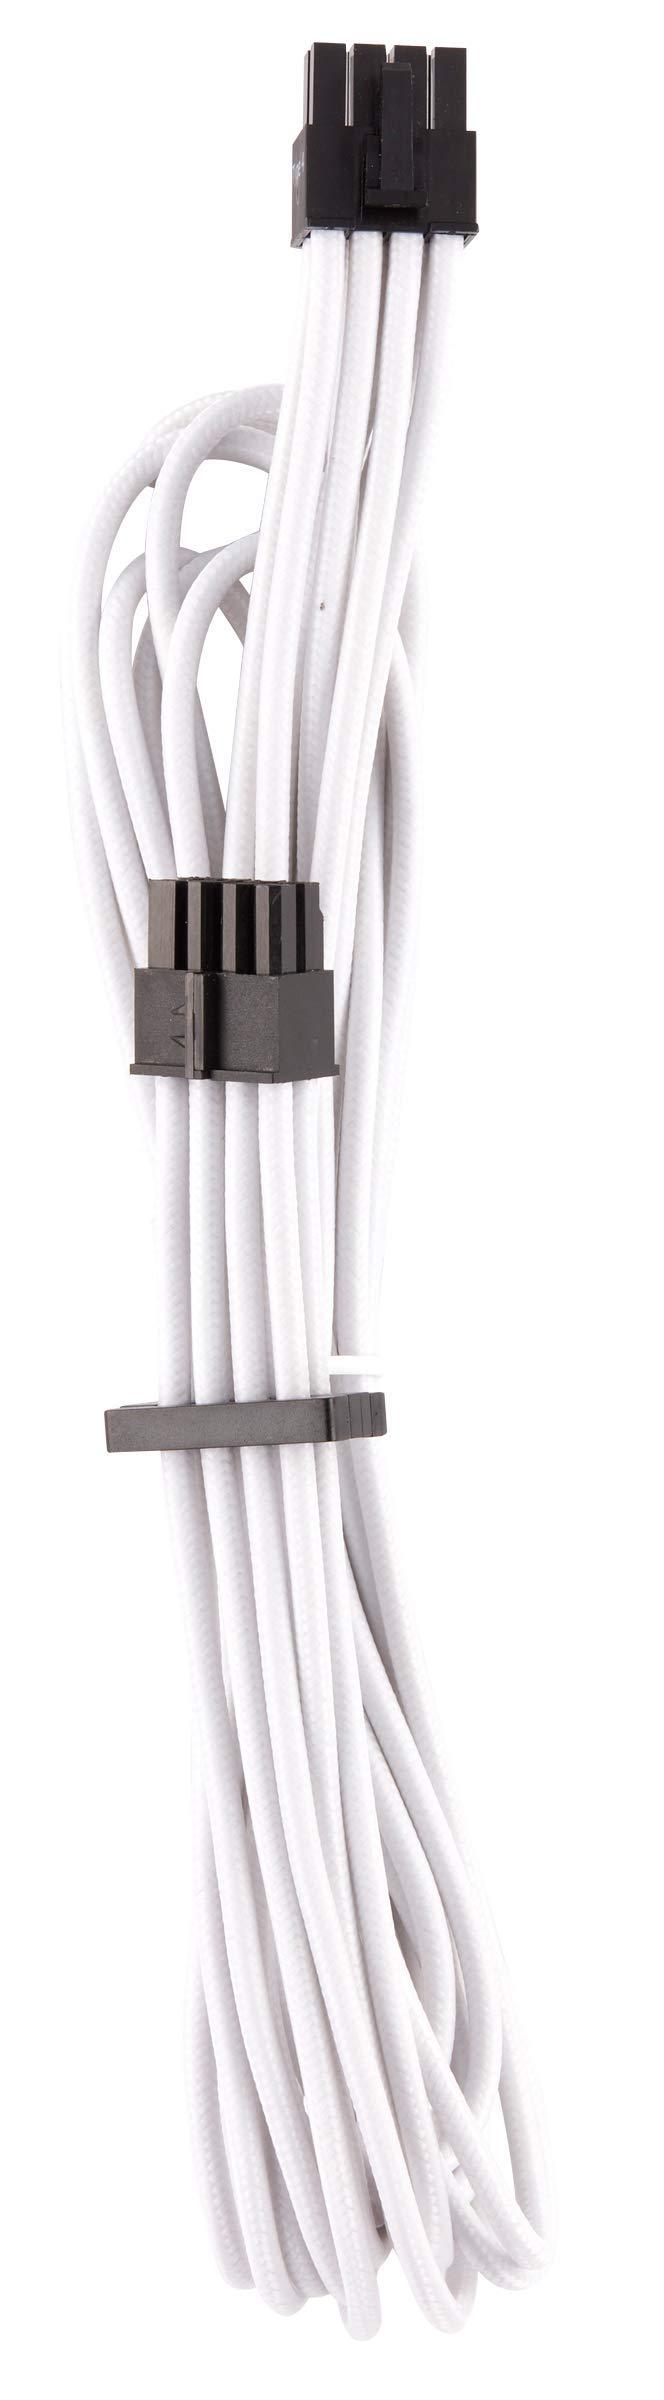 CORSAIR Premium Individually Sleeved PSU Cables Starter Kit - Black, 2 Yr Warranty, for Corsair PSUs by Corsair (Image #5)